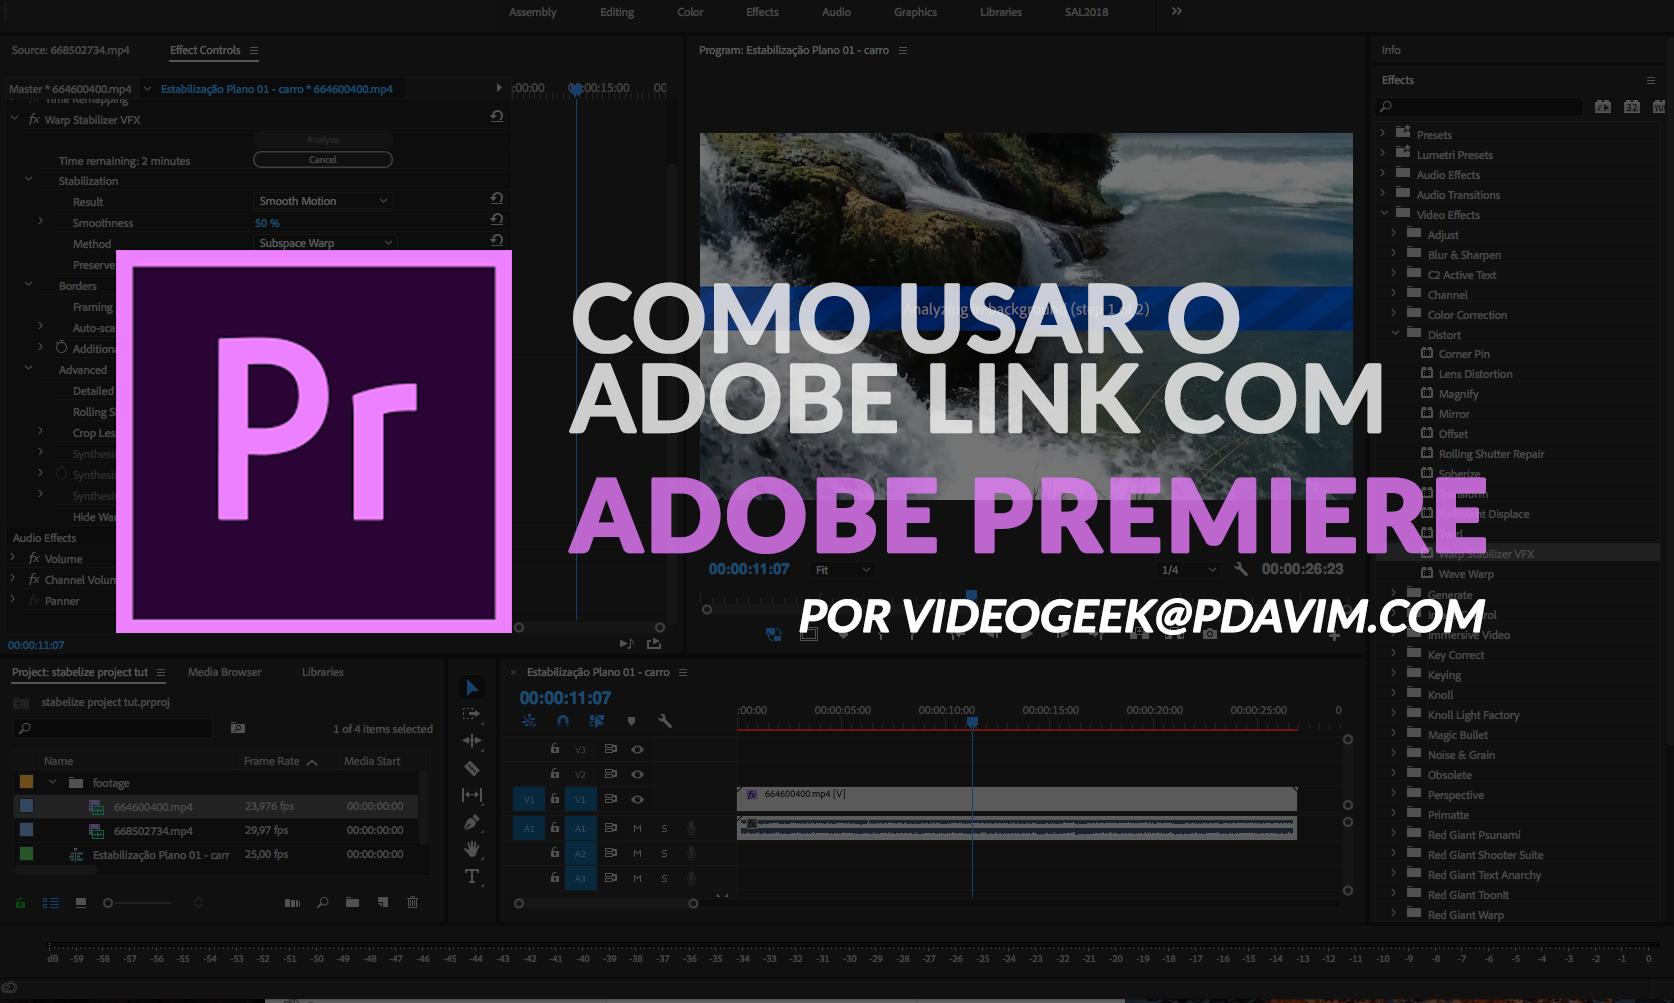 adobe link-pdavim Adobe Link | After Effects e Adobe Premiere Pro | Tutorial Adobe Premiere Pro - adobe link pdavim - Adobe Dynamic Link | Tutorial After Effects | Adobe Premiere Pro